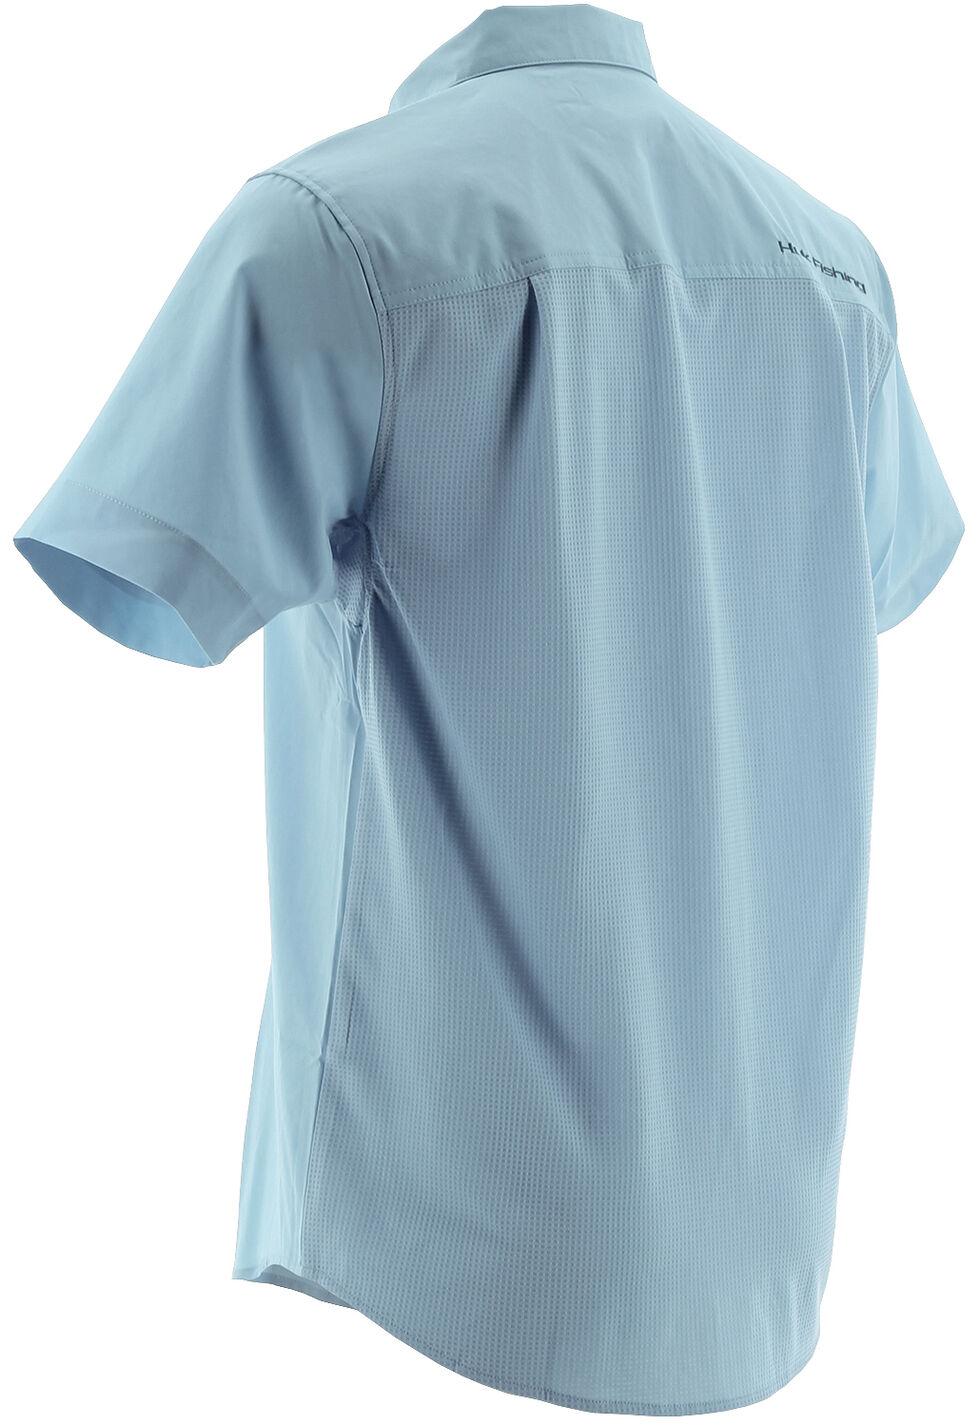 Huk Performance Fishing Men's Phenom Short Sleeve Shirt , Light Blue, hi-res